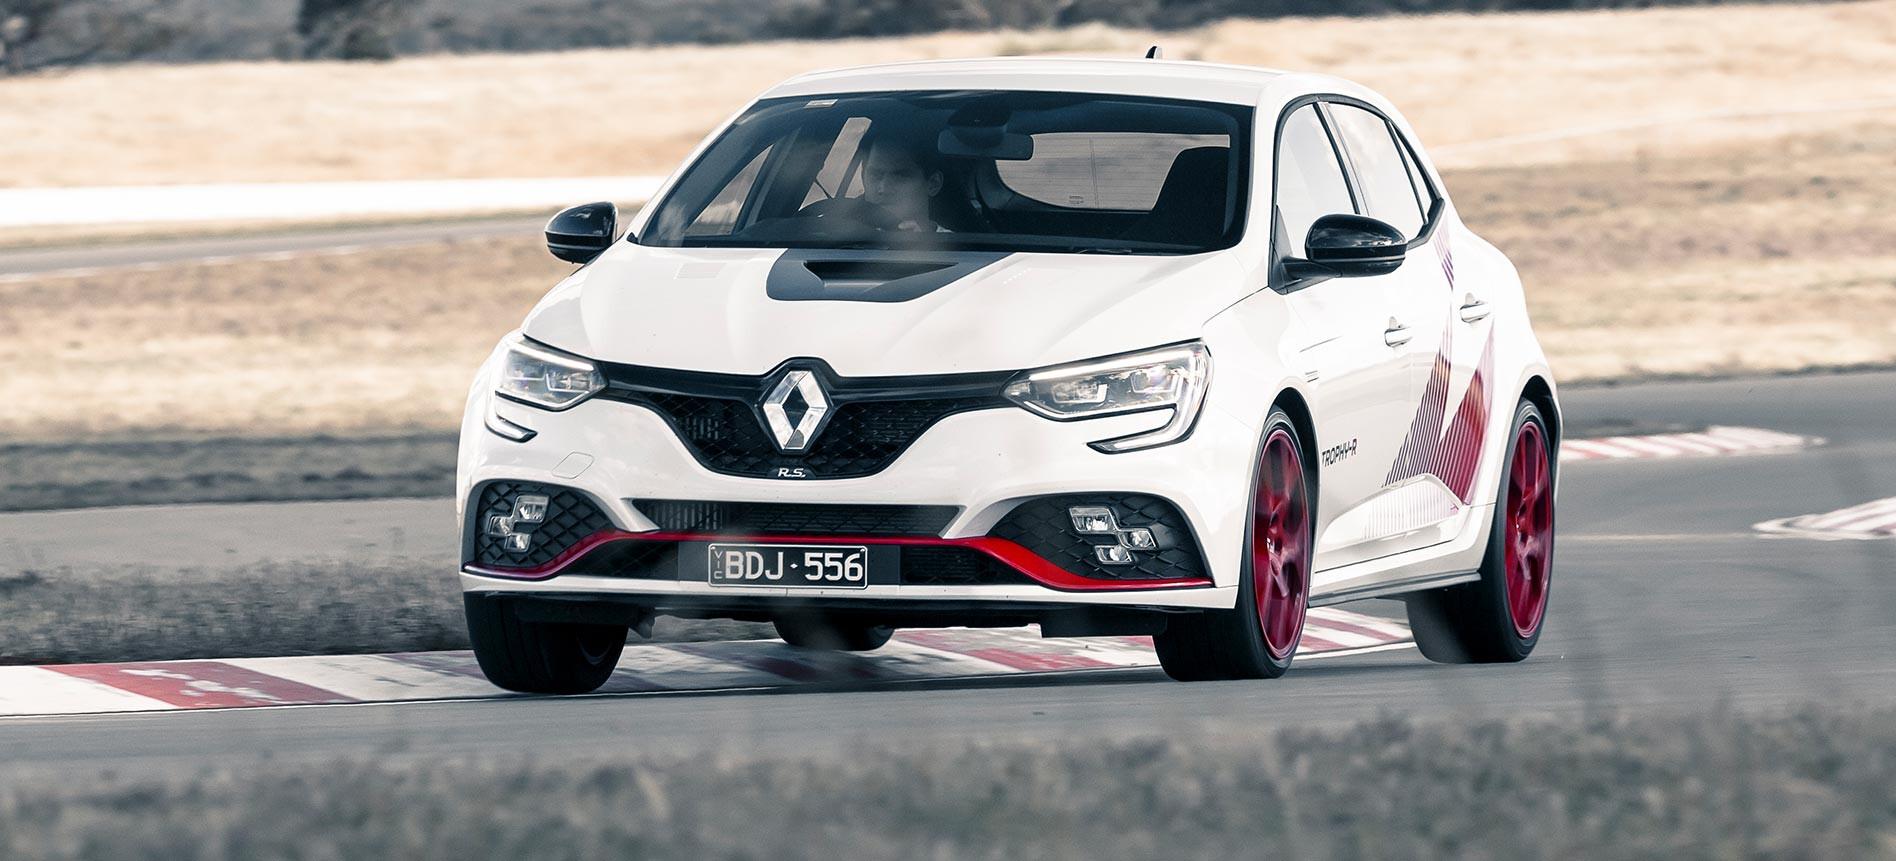 Renault Megane Trophy-R review feature